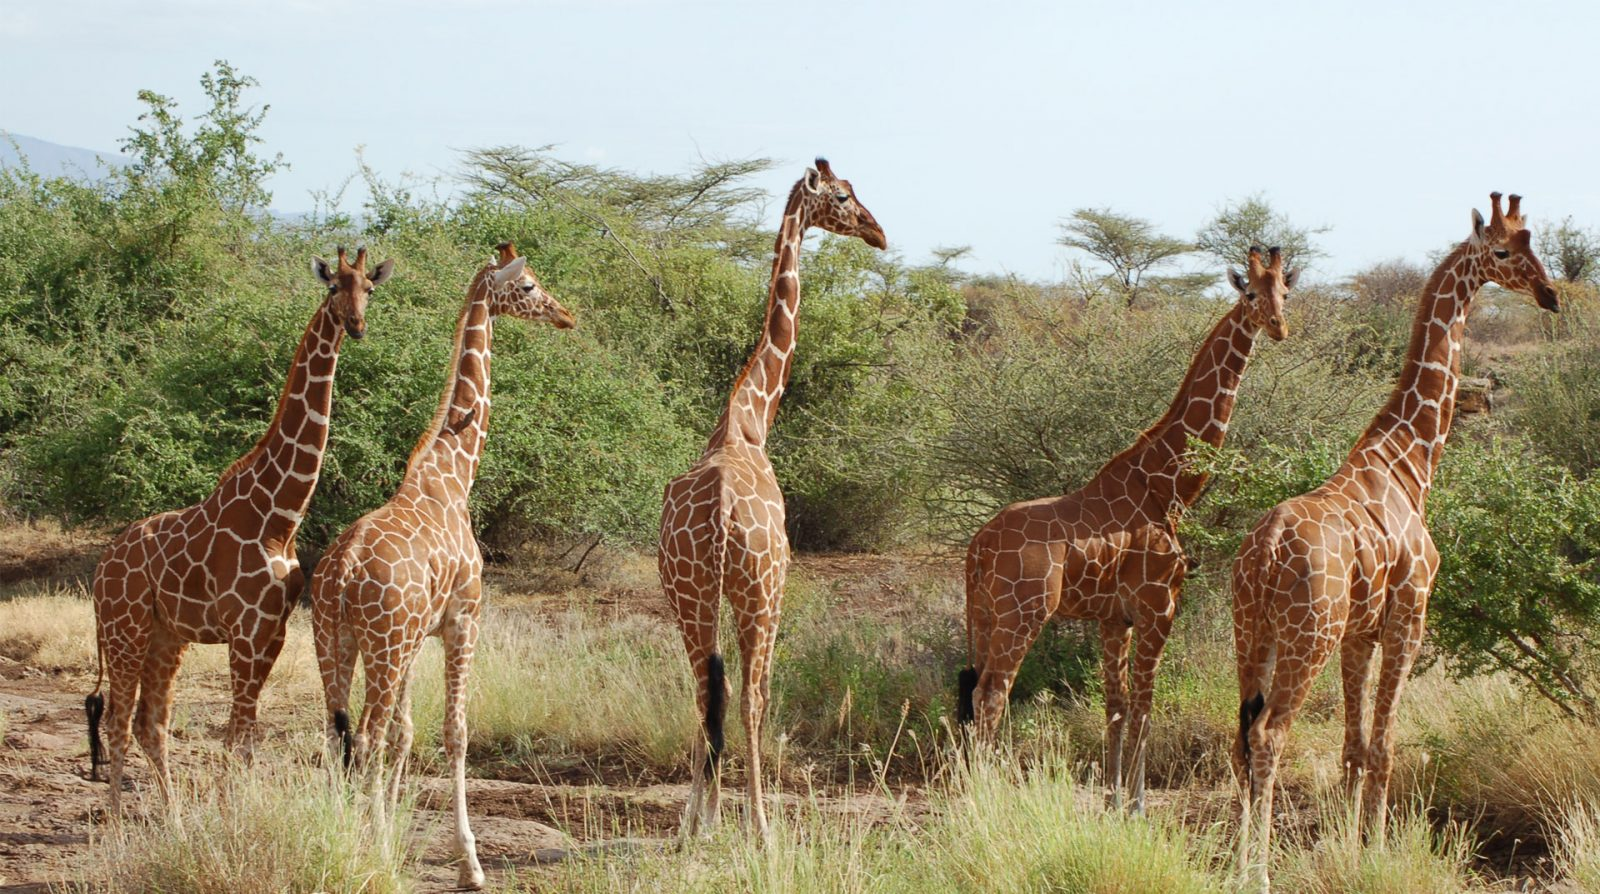 Kenya Safaris and Tours | Reticulated giraffe - Samburu National Reserve